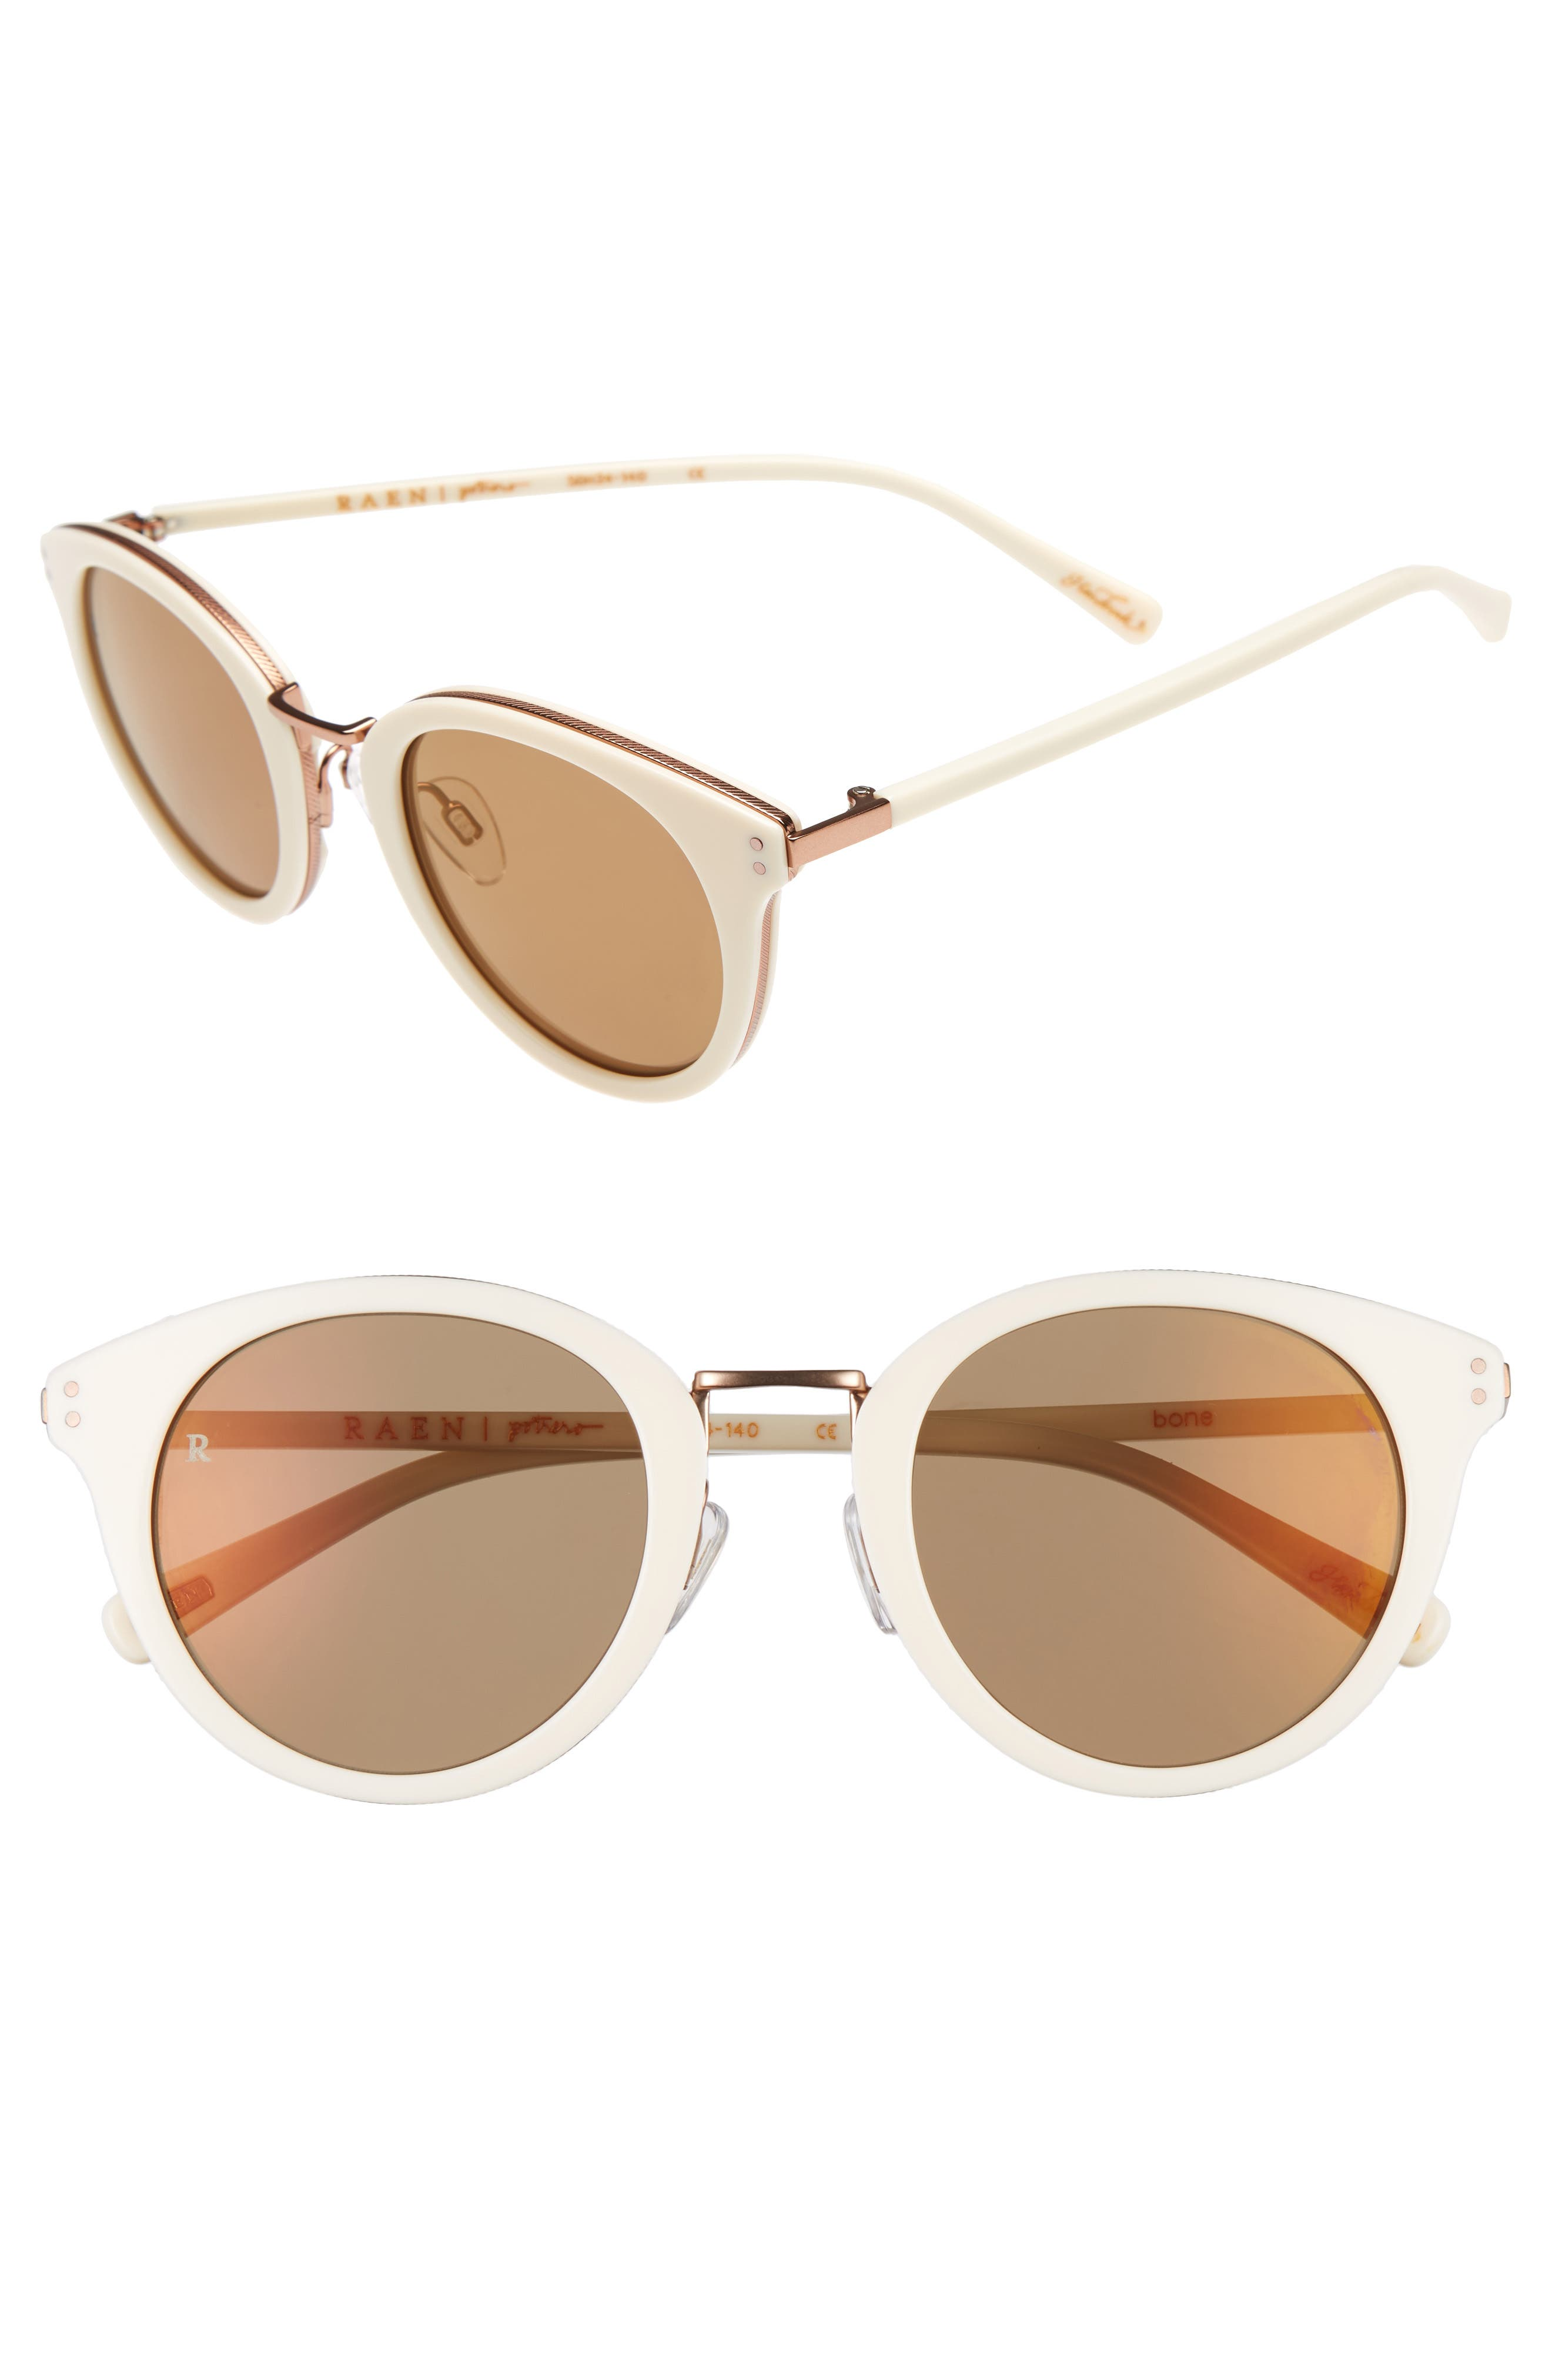 Portrero 50mm Sunglasses,                             Alternate thumbnail 2, color,                             100